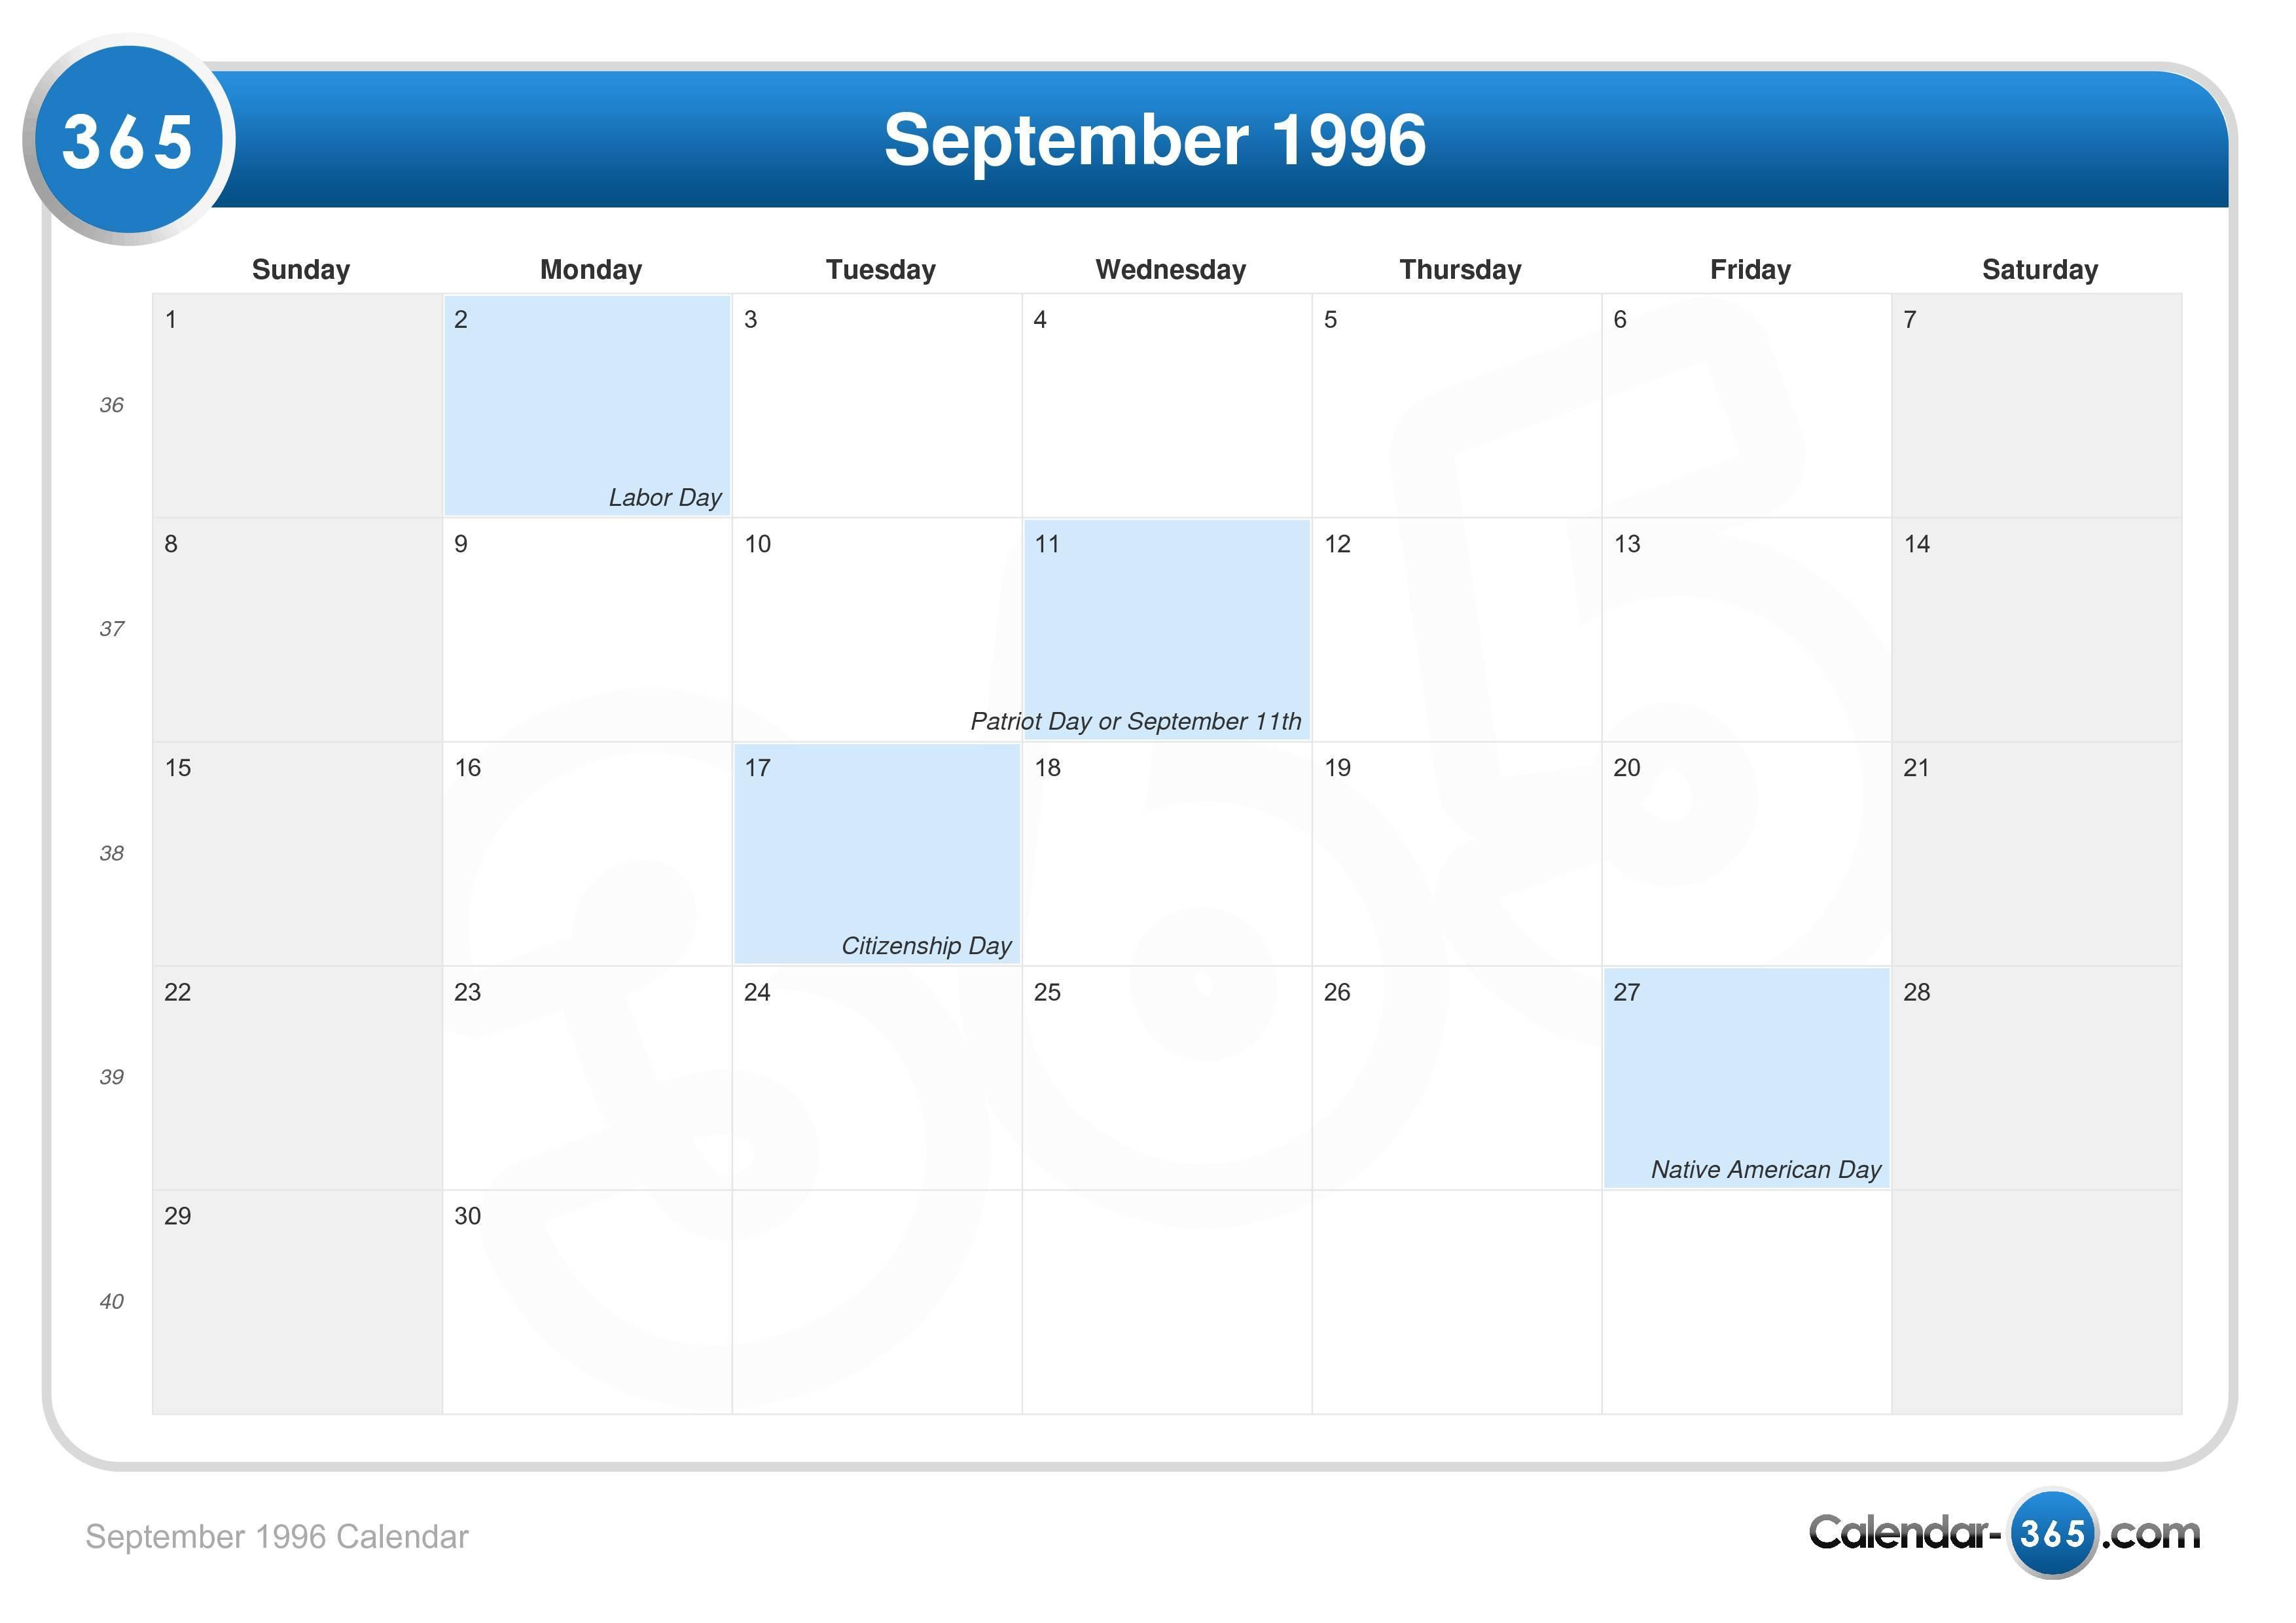 September 1996 Calendar